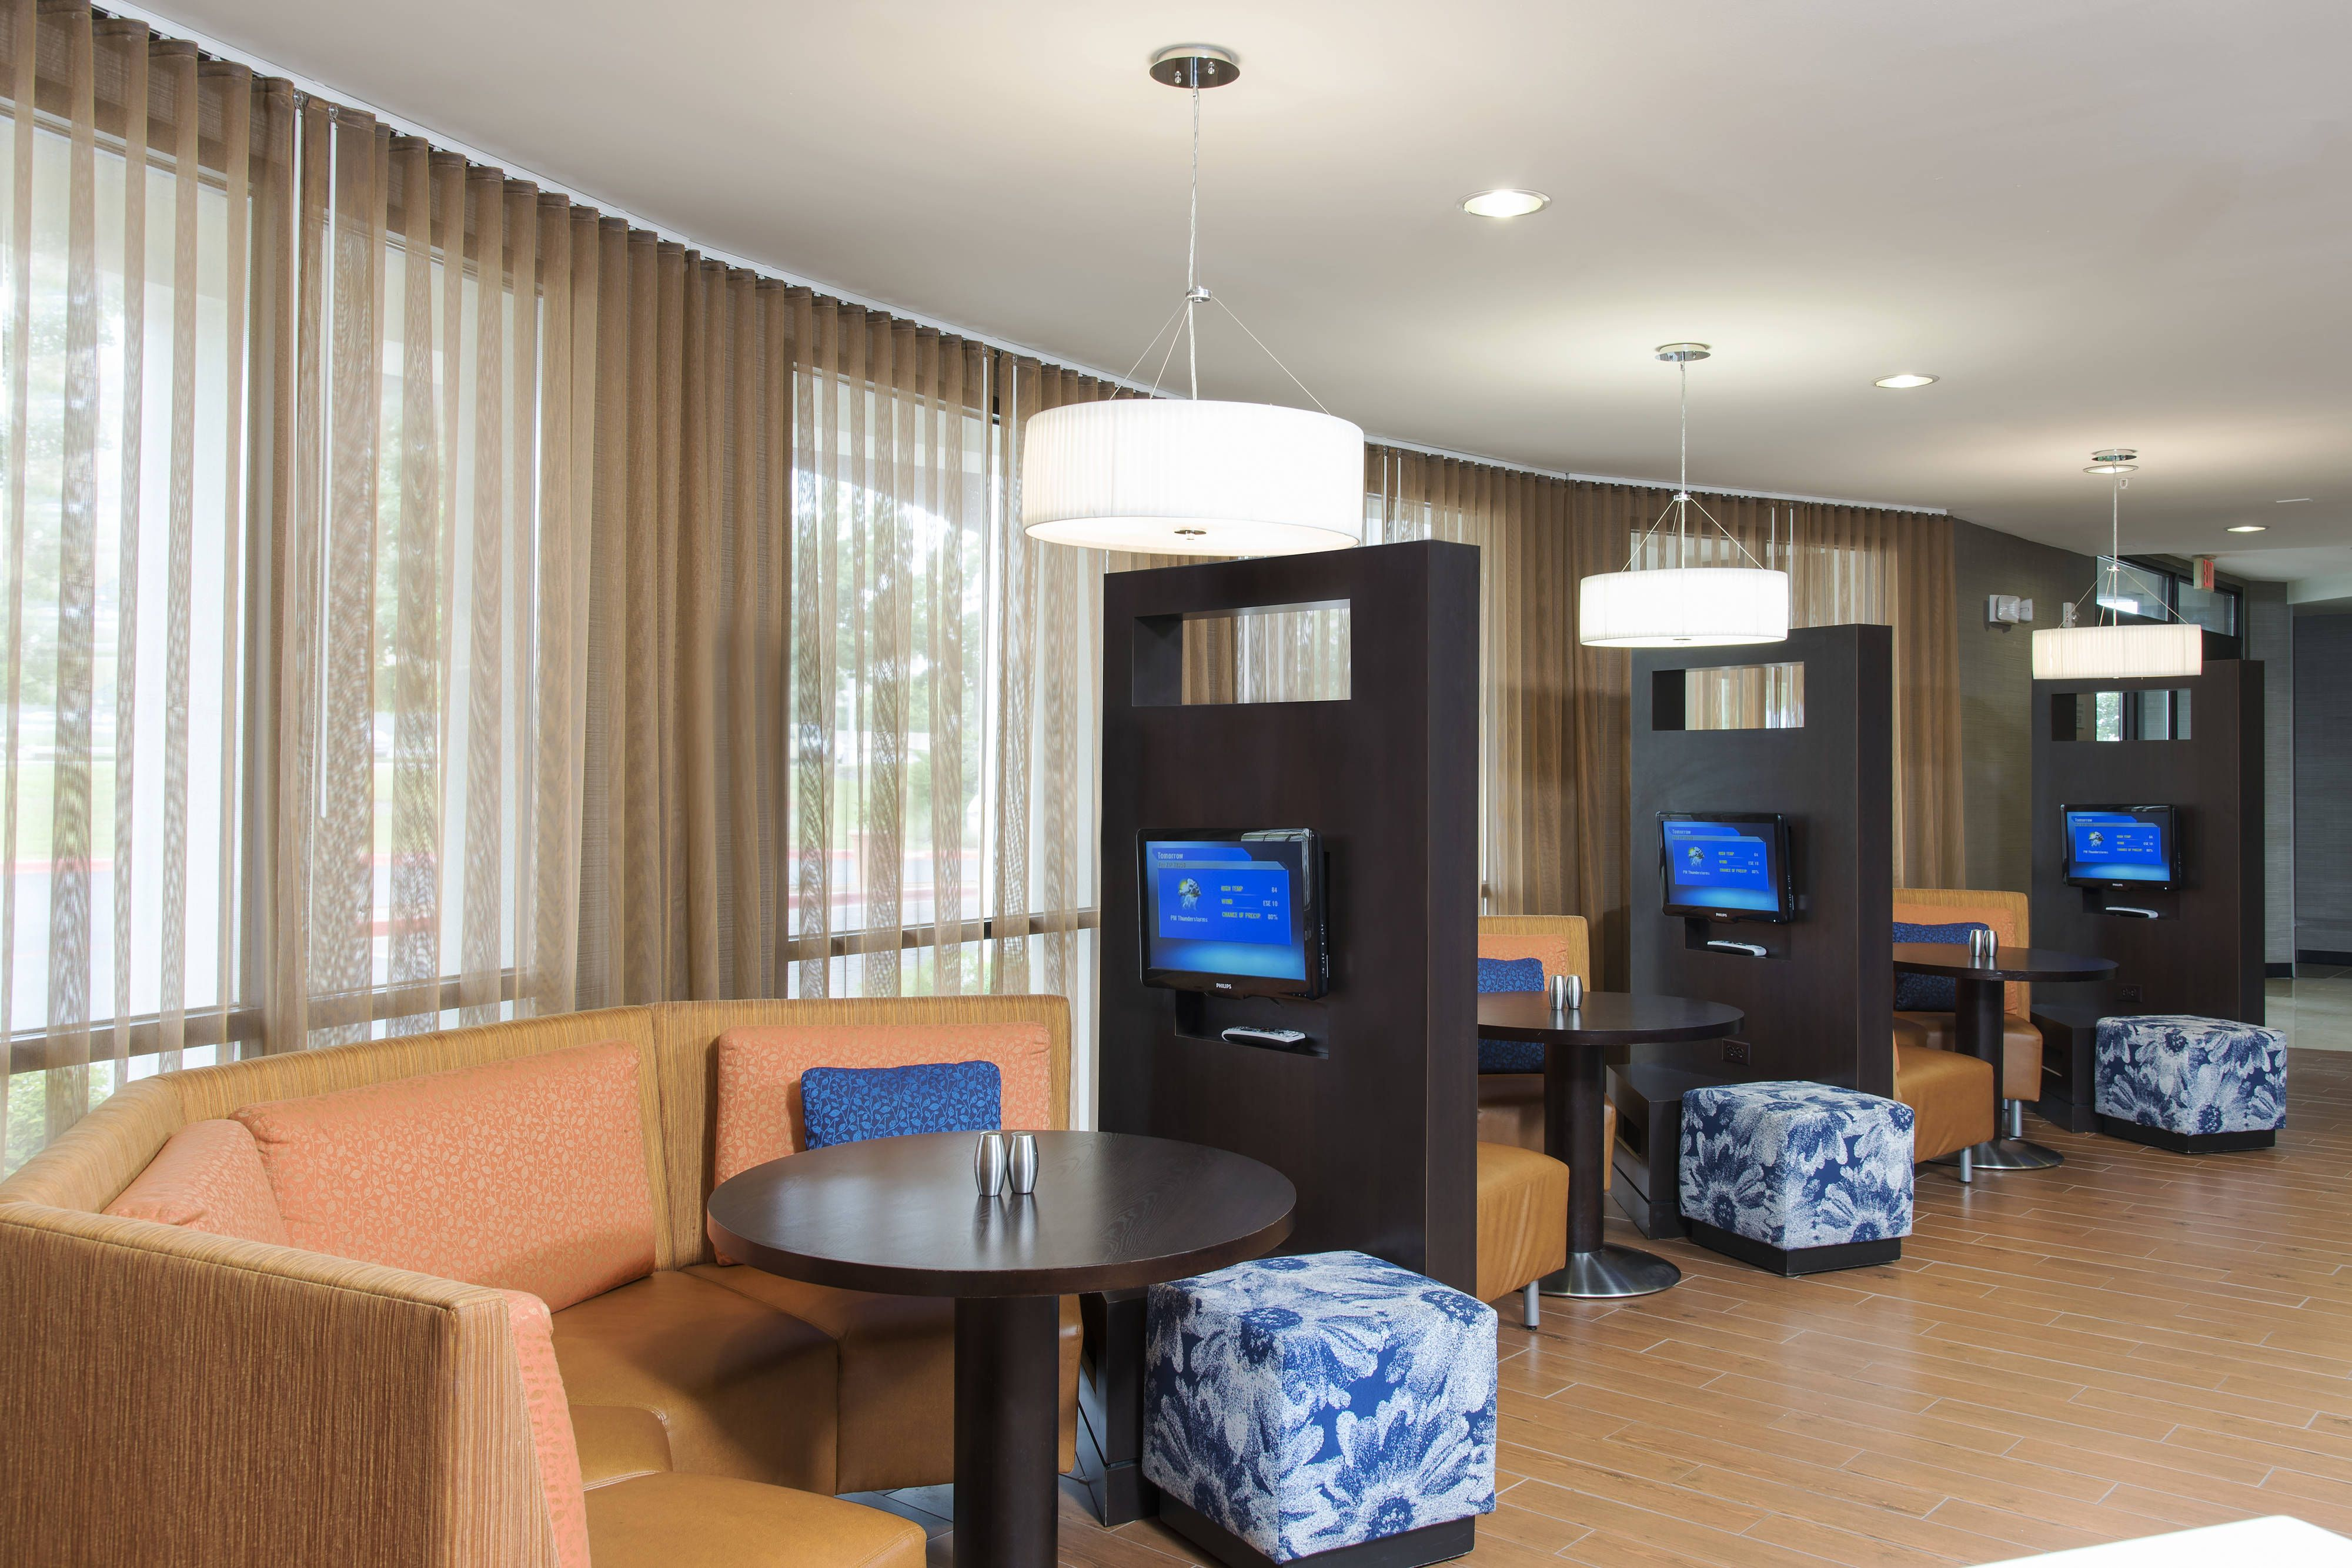 Courtyard San Antonio North Stone Oak At Legacy Media Pods Holiday Guestroom Memorable Hotel Architecture Courtyard Oak